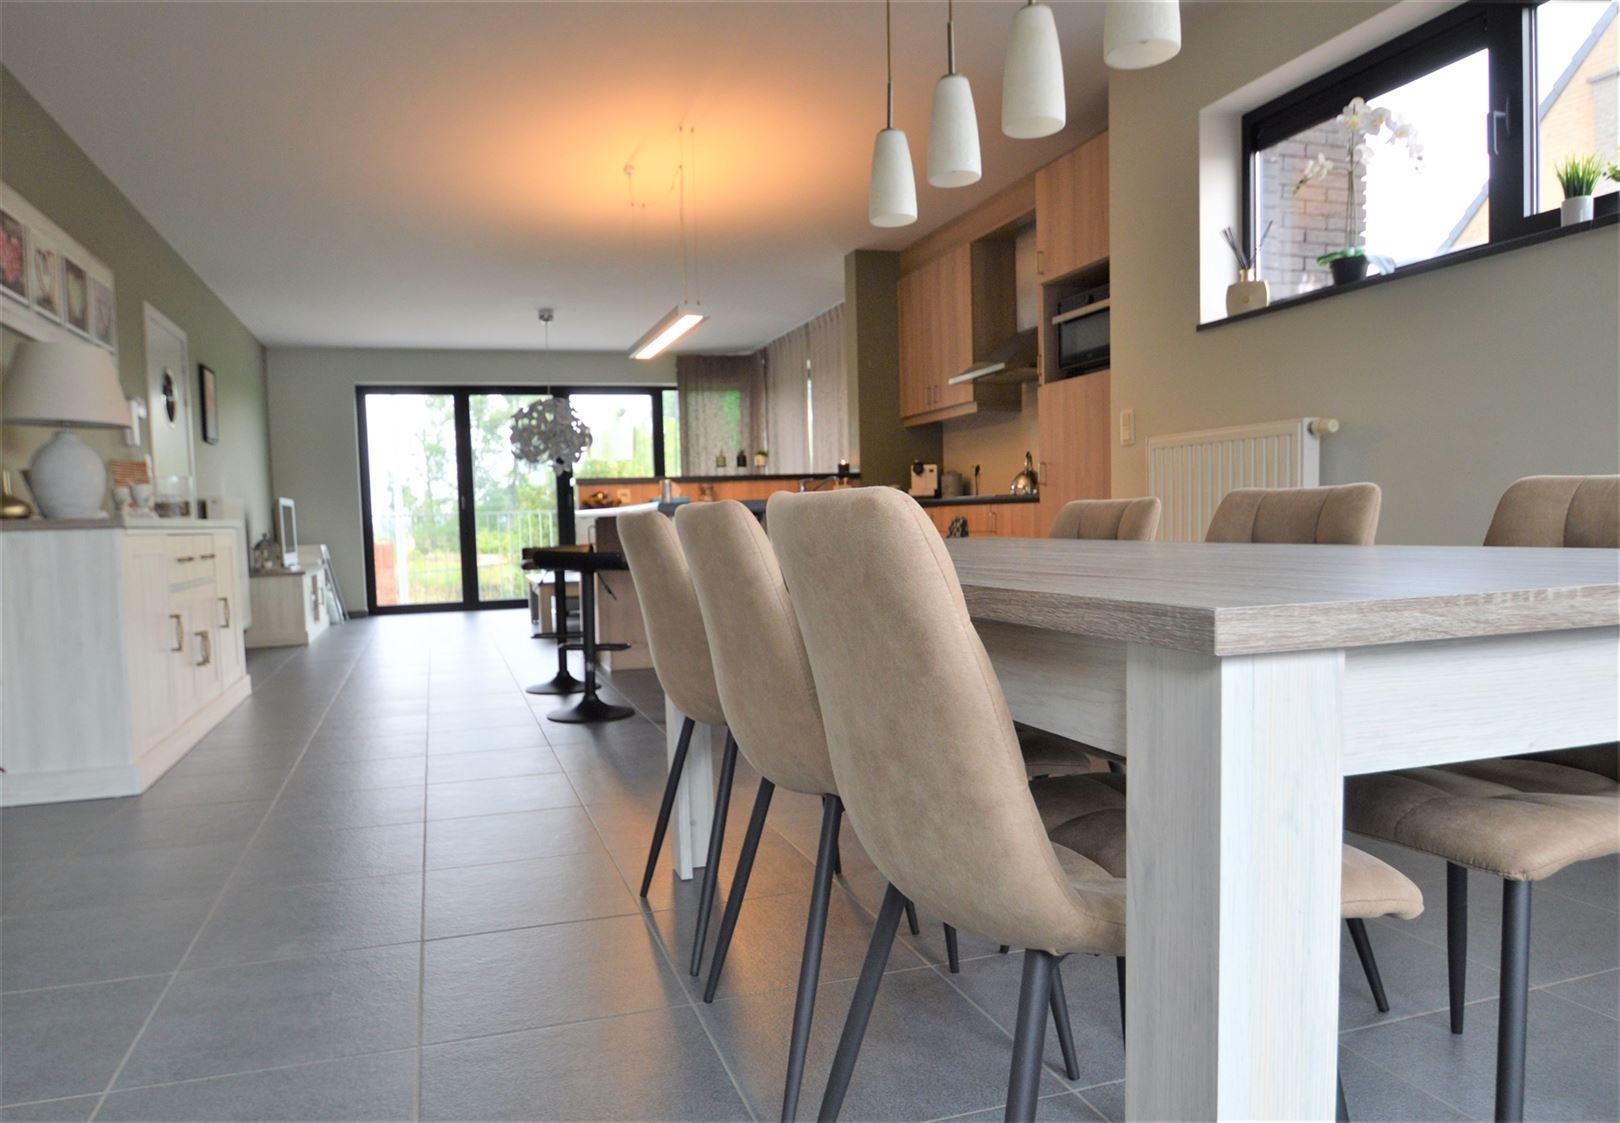 Foto 3 : Appartement te 9200 BAASRODE (België) - Prijs € 750